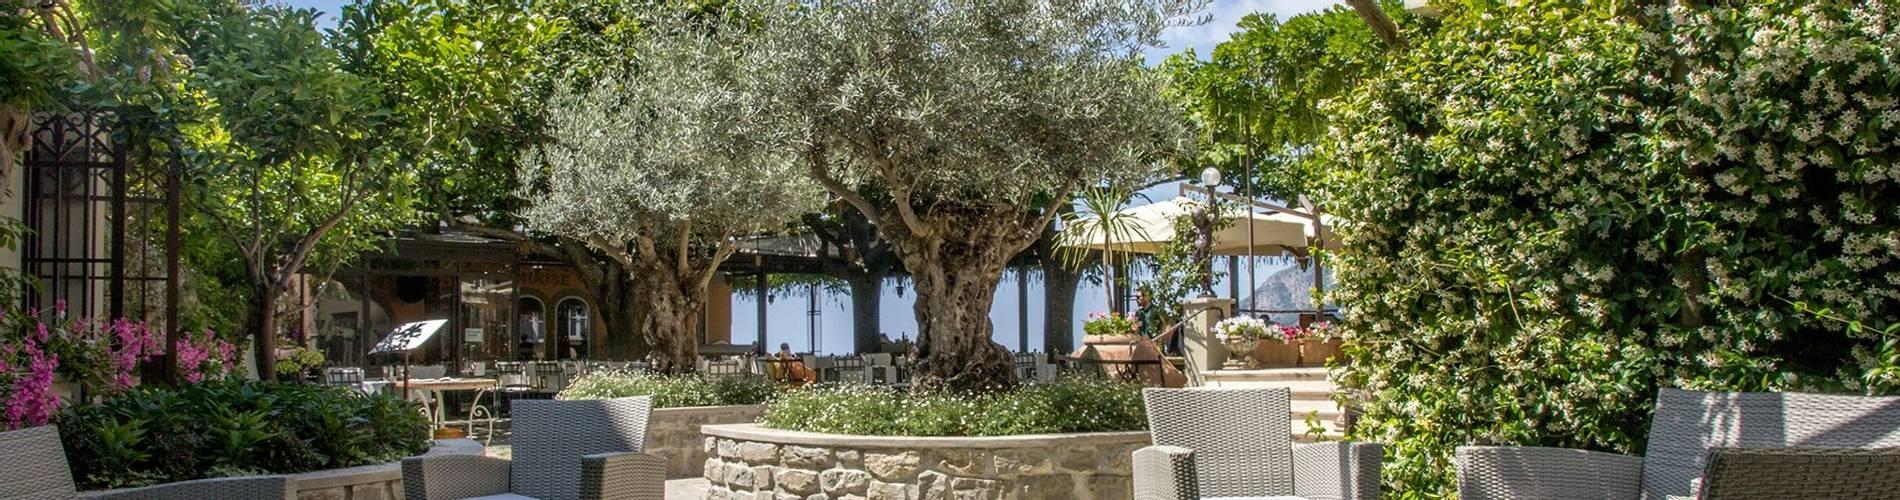 Villa Maria, Amalfi Coast, Italy, terrace.jpg